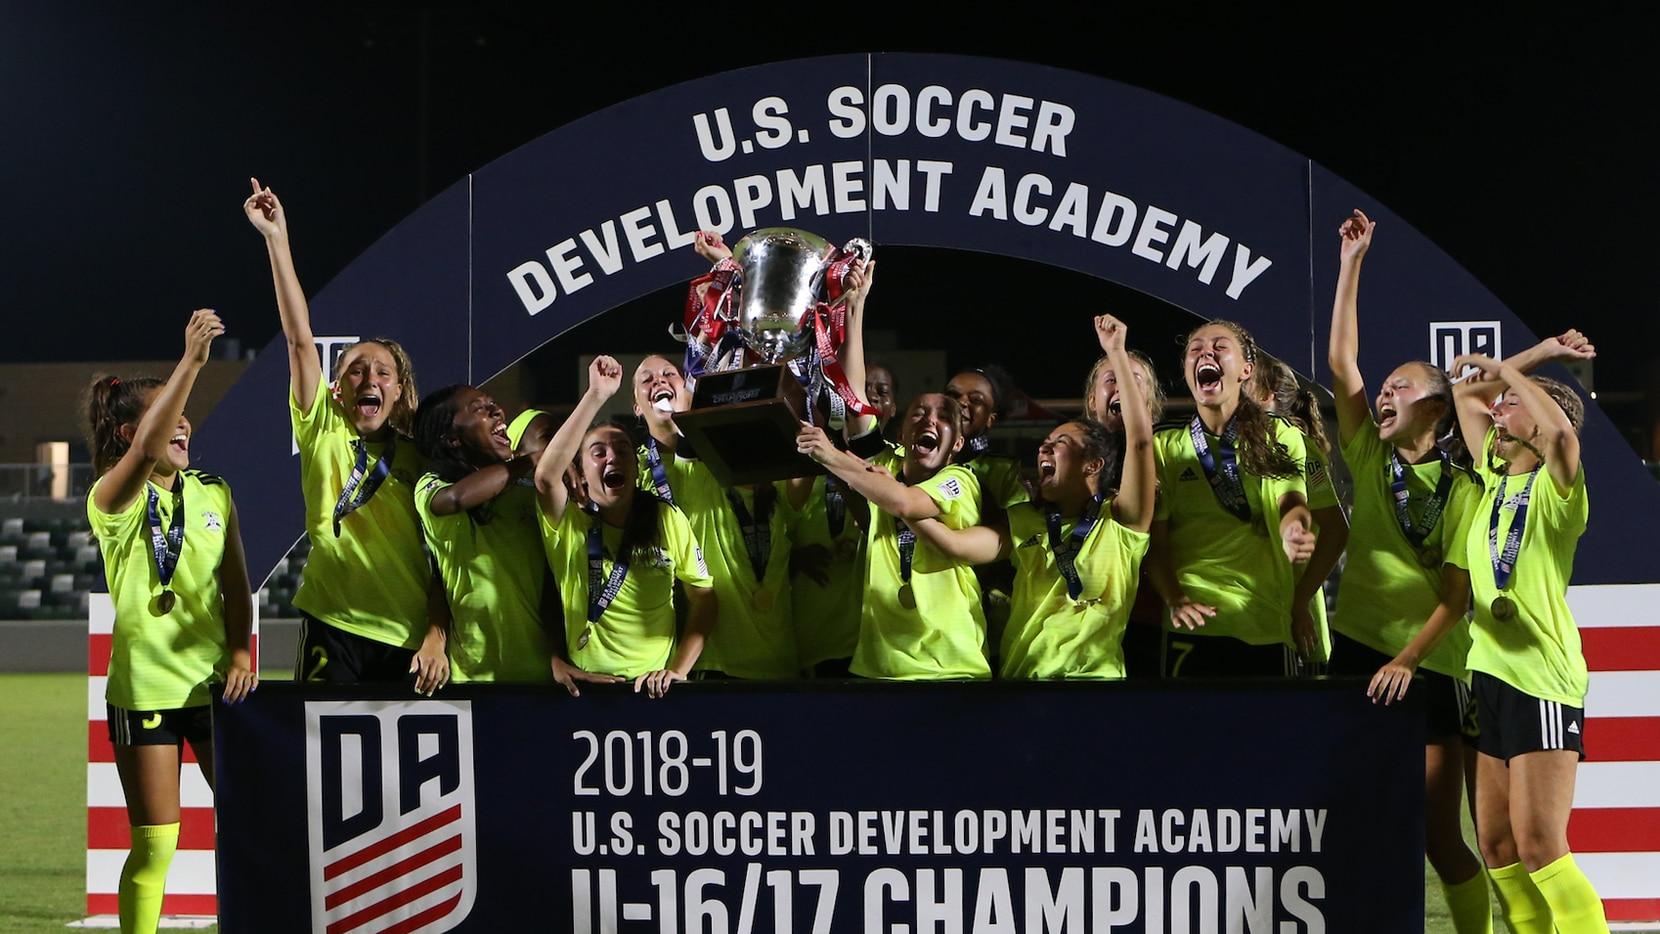 Solar SC celebrate after winning the U-16/17 girls national championship